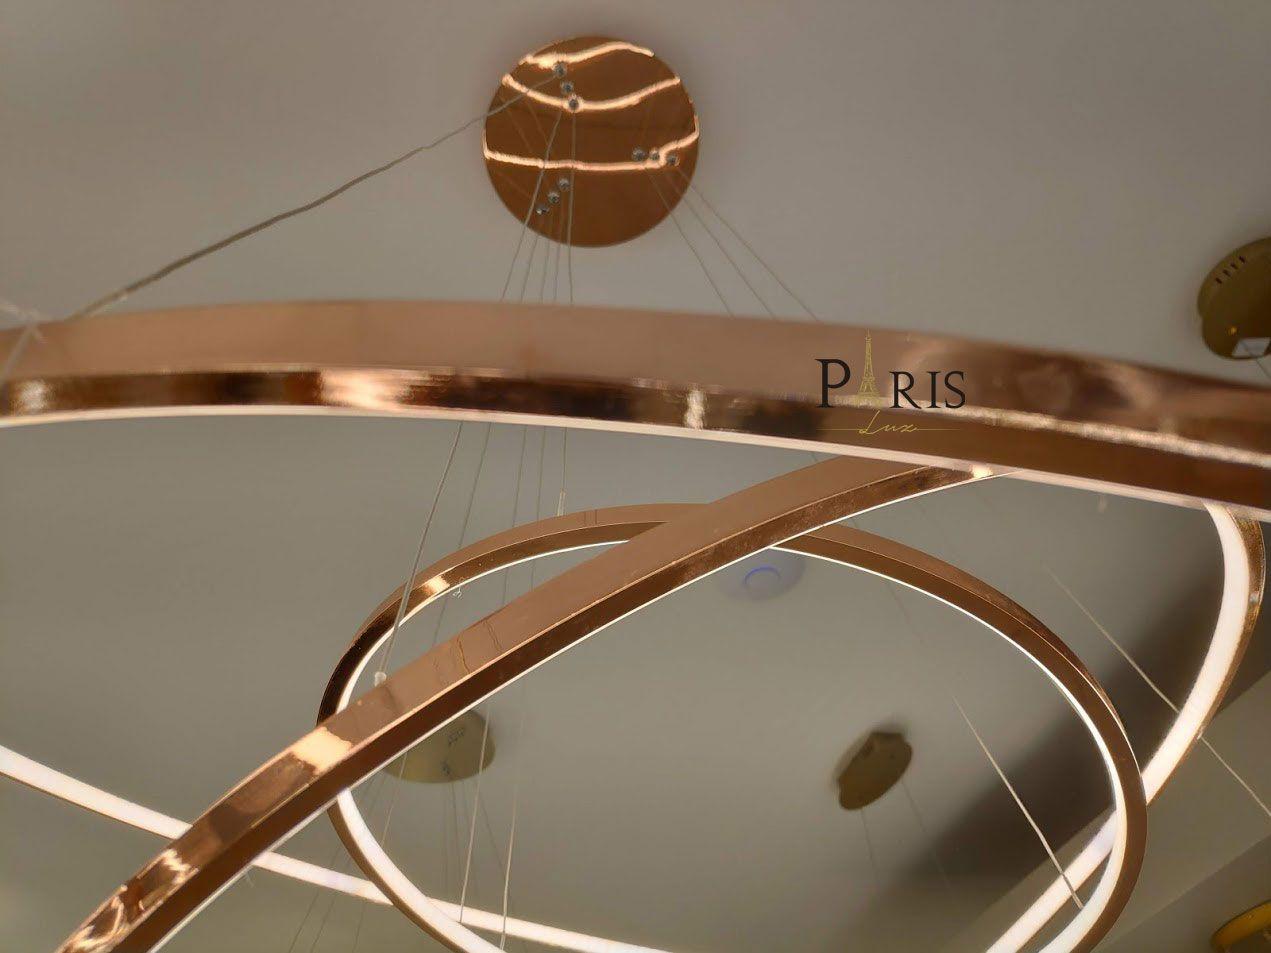 Pendente Rings Birdie Anéis Rosê Gold Cobre 80cm Led 3200K 39W KW002E Bella